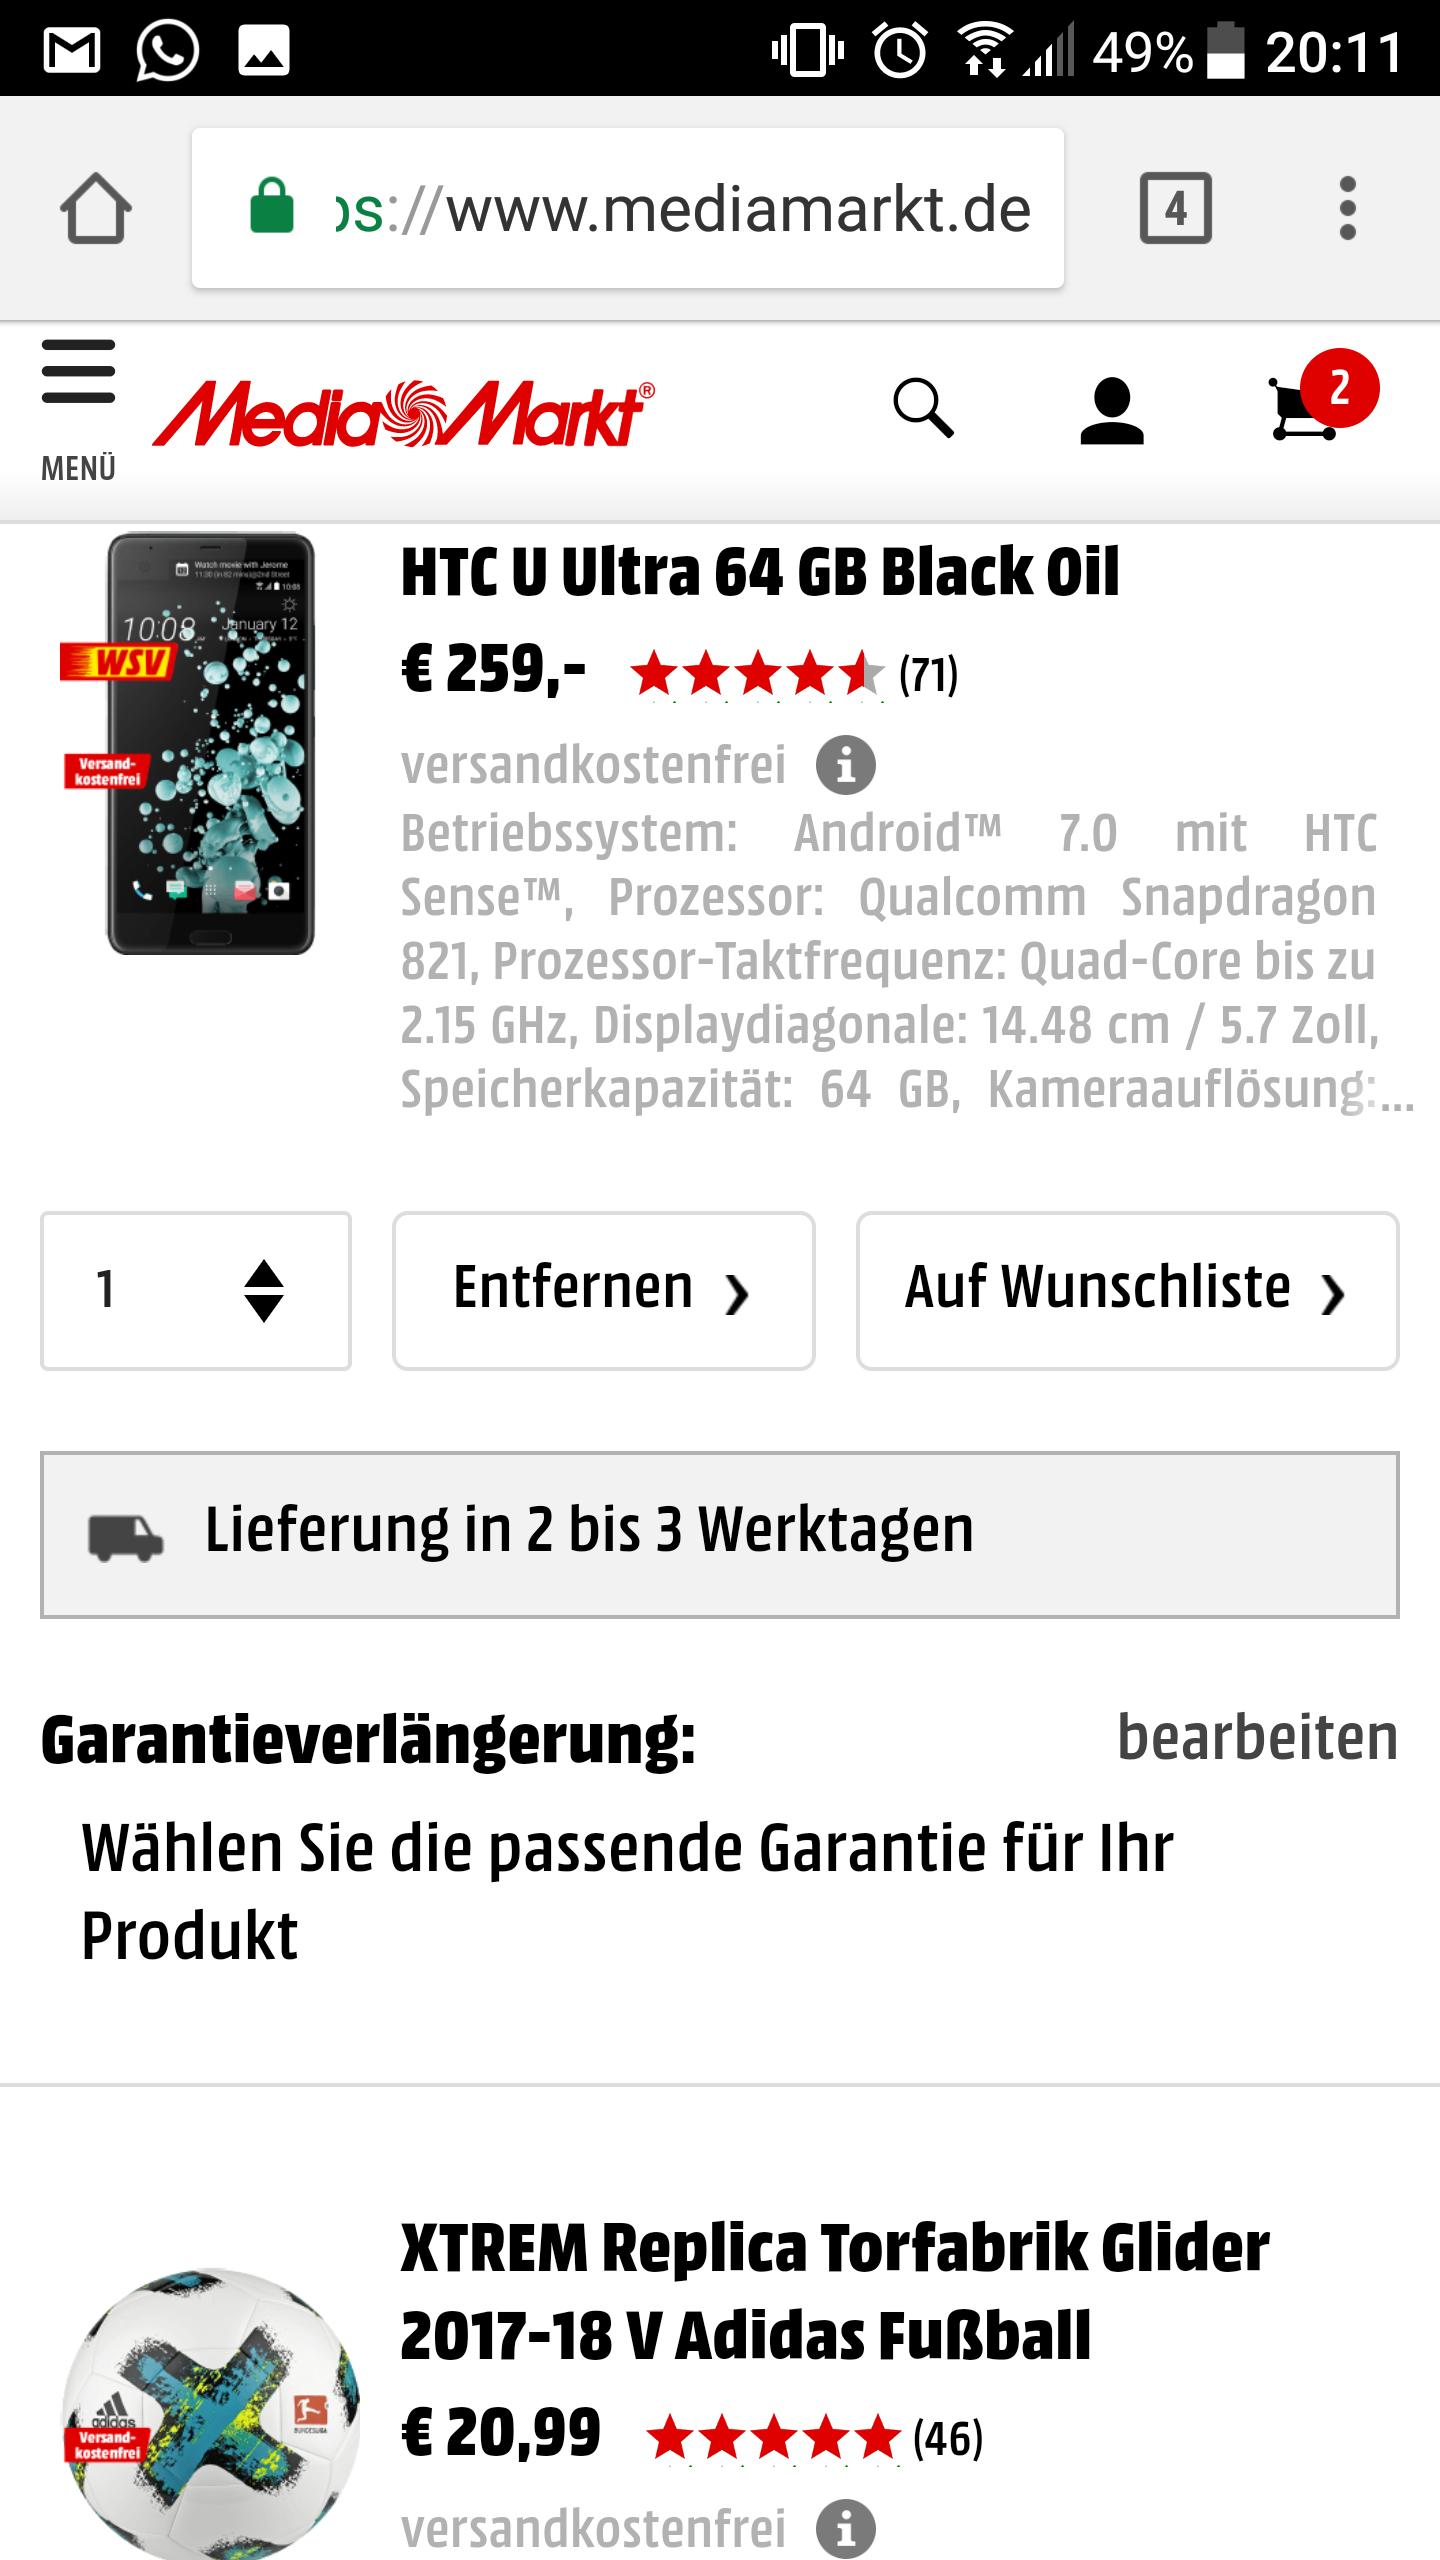 HTC U Ultra 64 GB + Adidas Fussball 259€